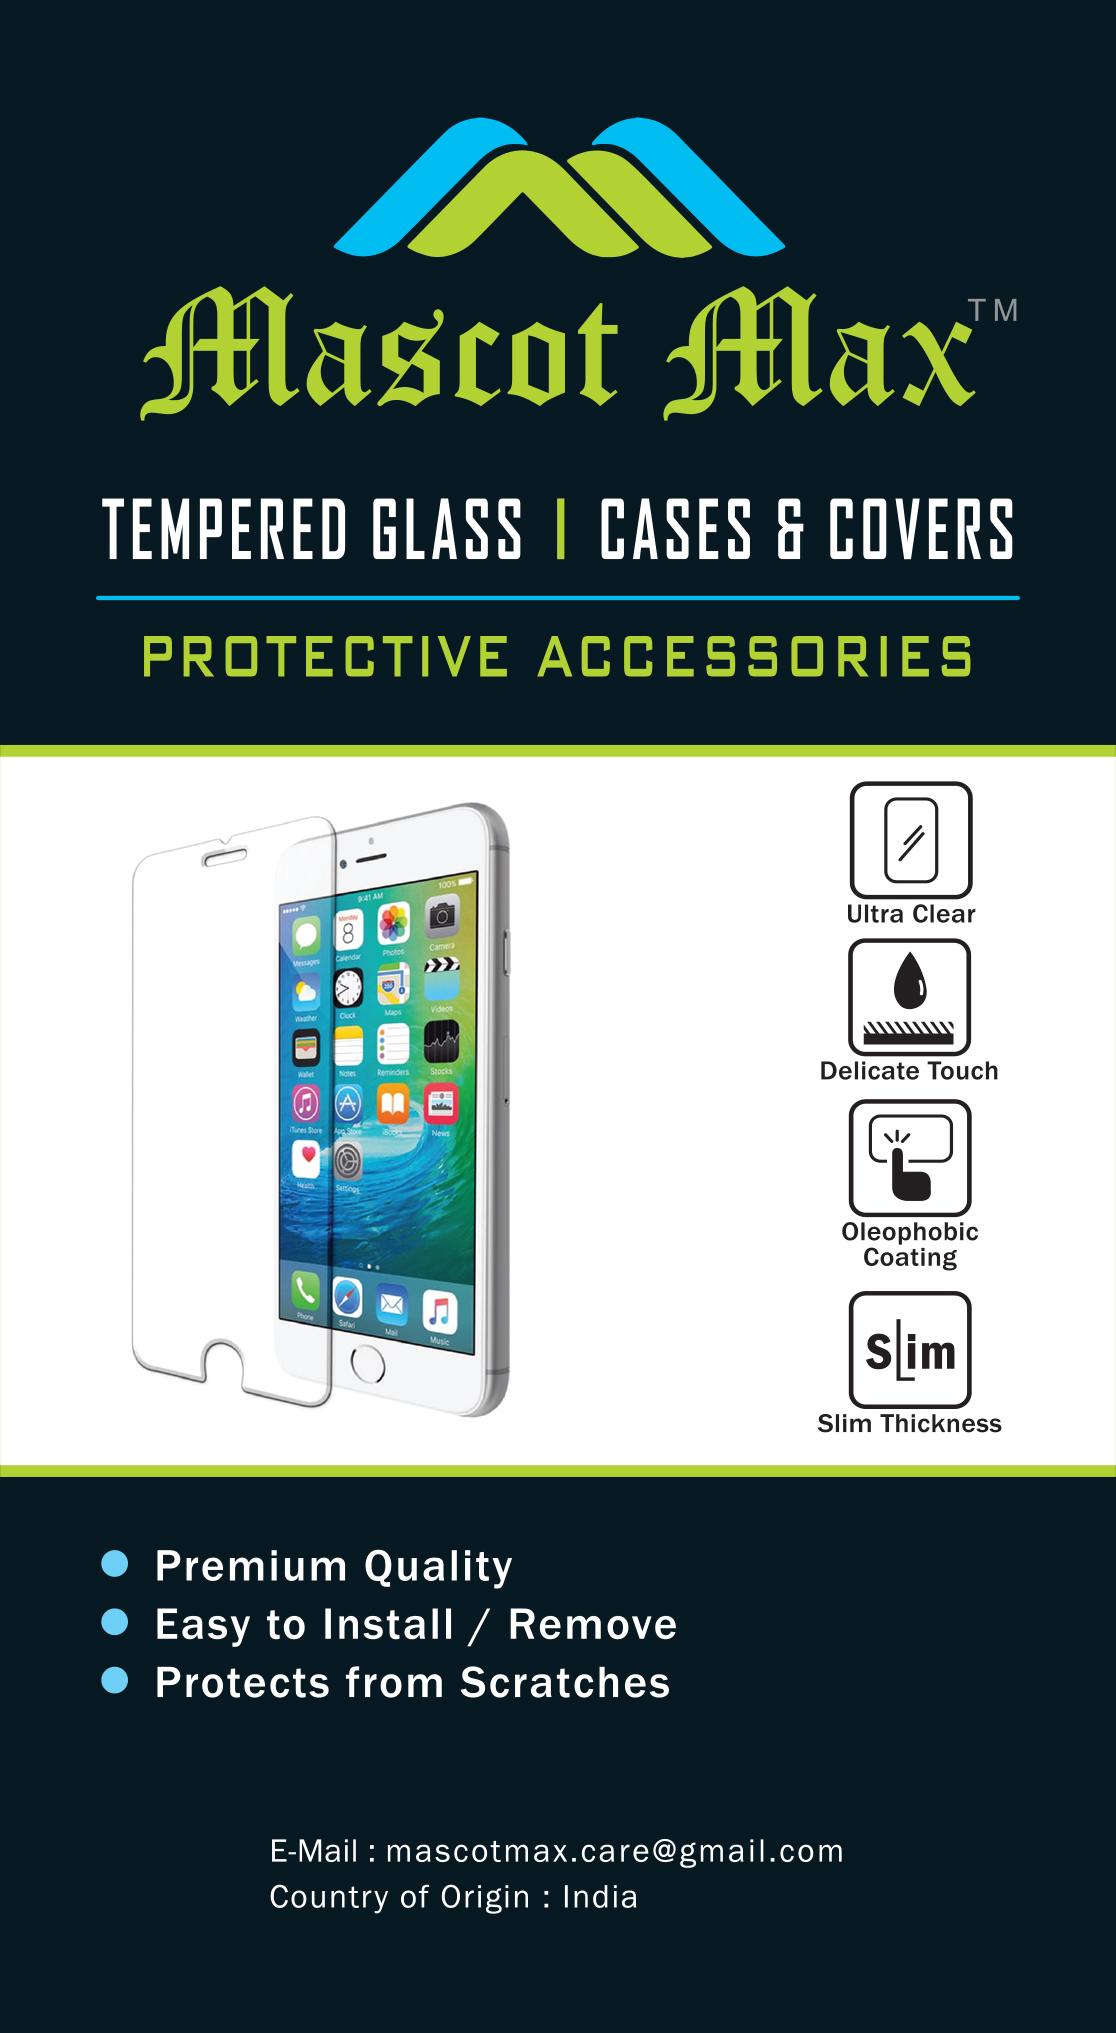 Lenovo Vibe K6 Power Tempered Glass Screen Guard By Mascot max